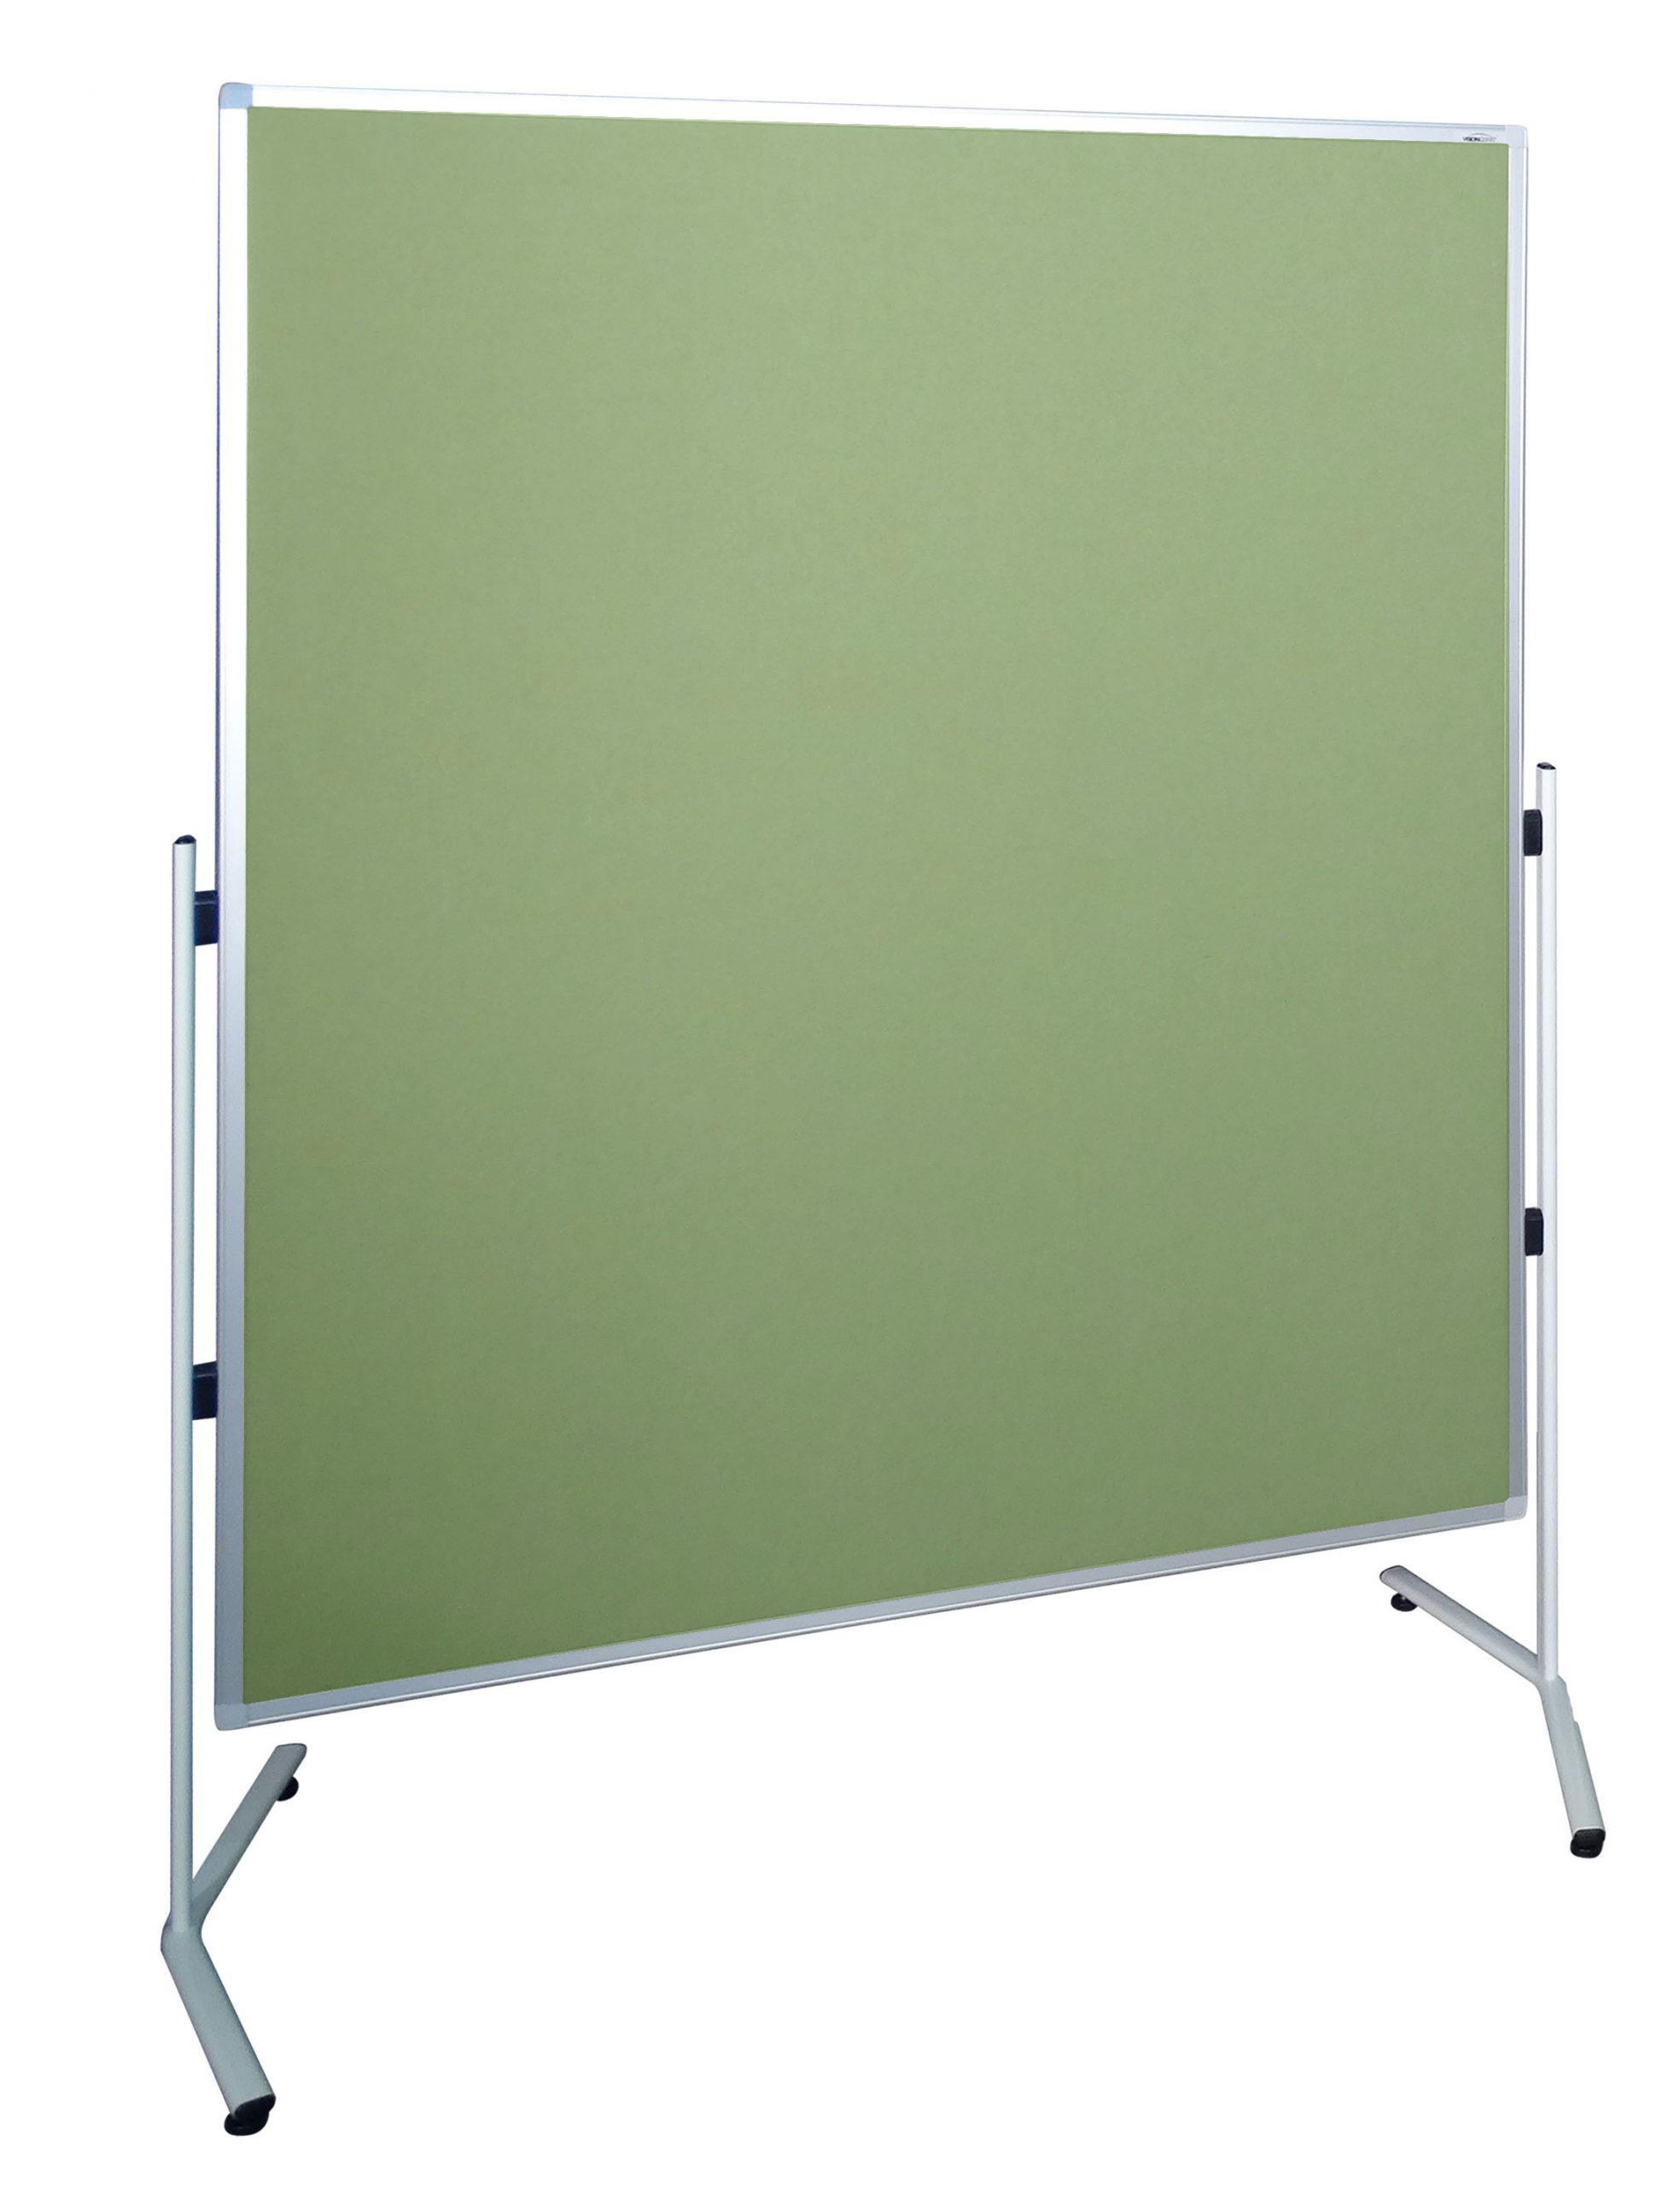 Room Divider Modulo T-Leg Pinboard